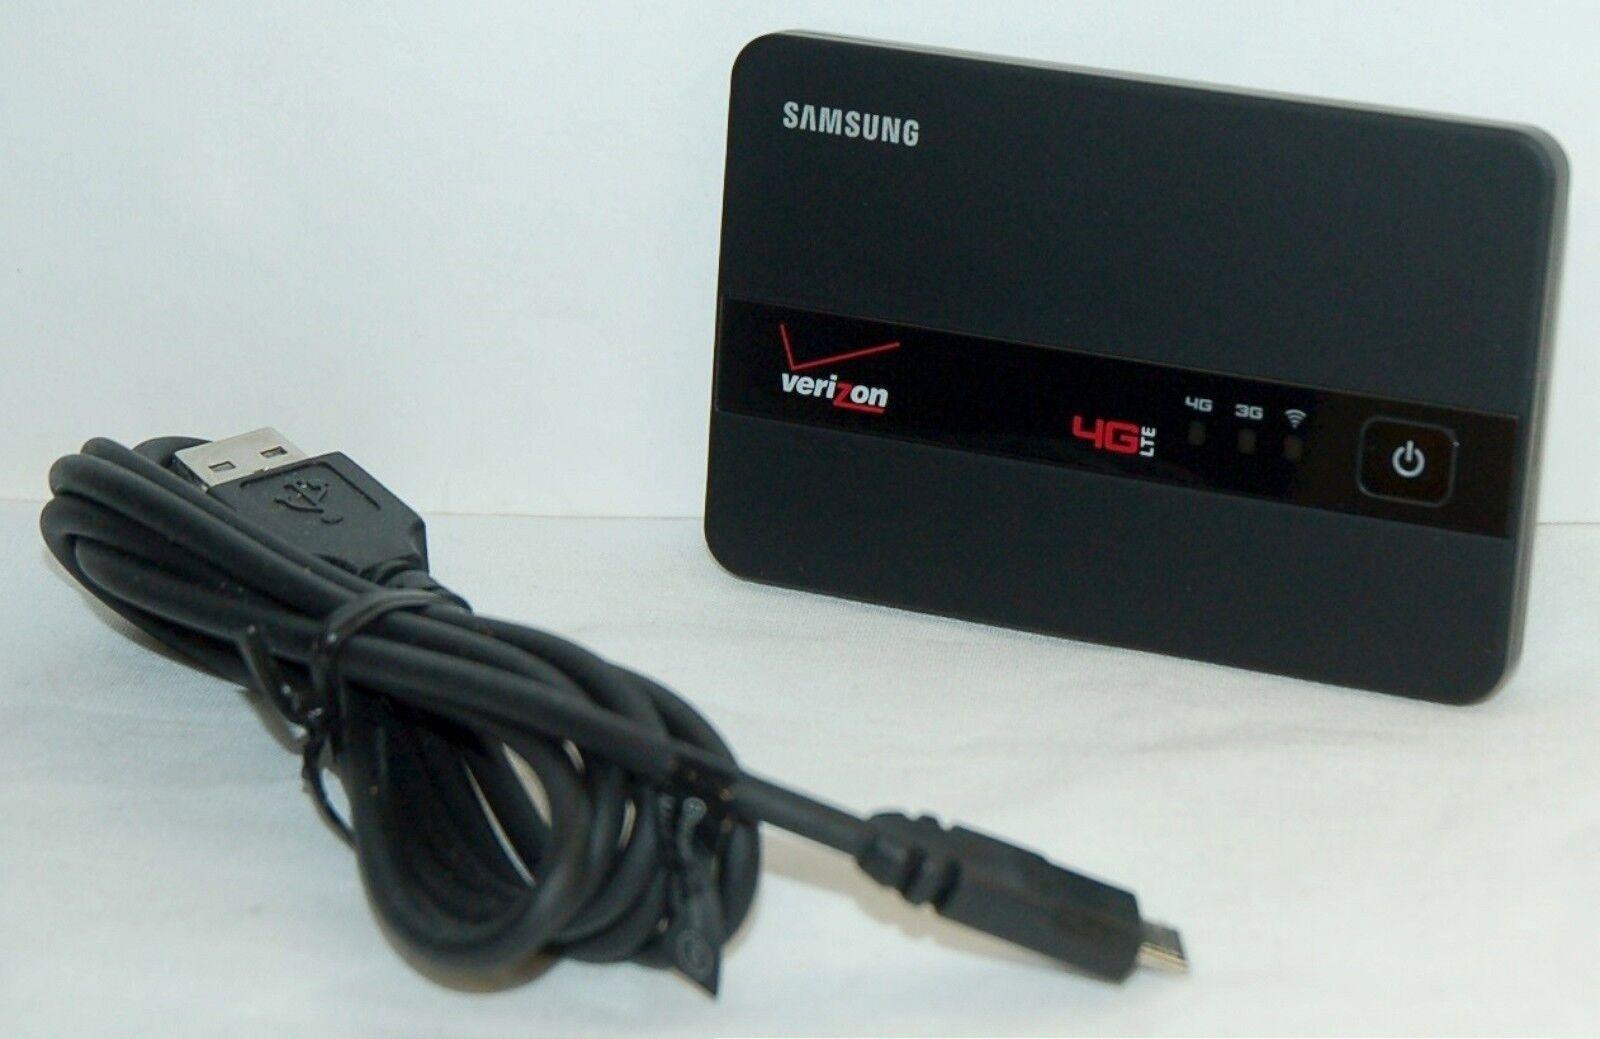 Samsung Jetpack 4g Lte Mobile Wireless Hotspot Verizon Sch